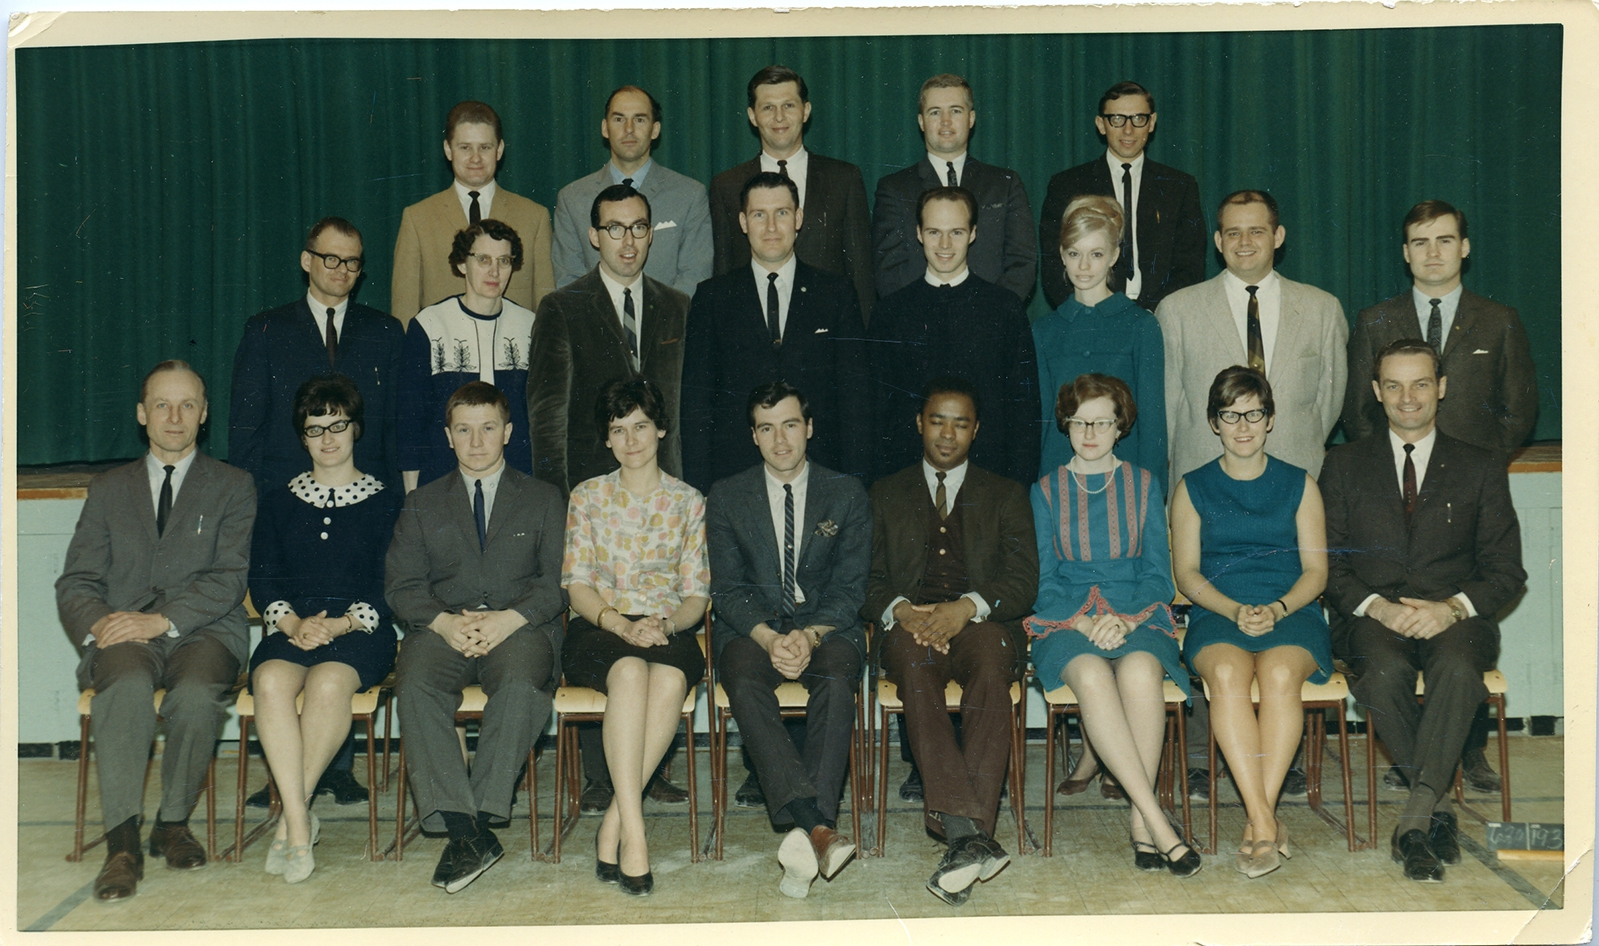 Podruski-Fonds-1949-Teachers-Easter-Convention1